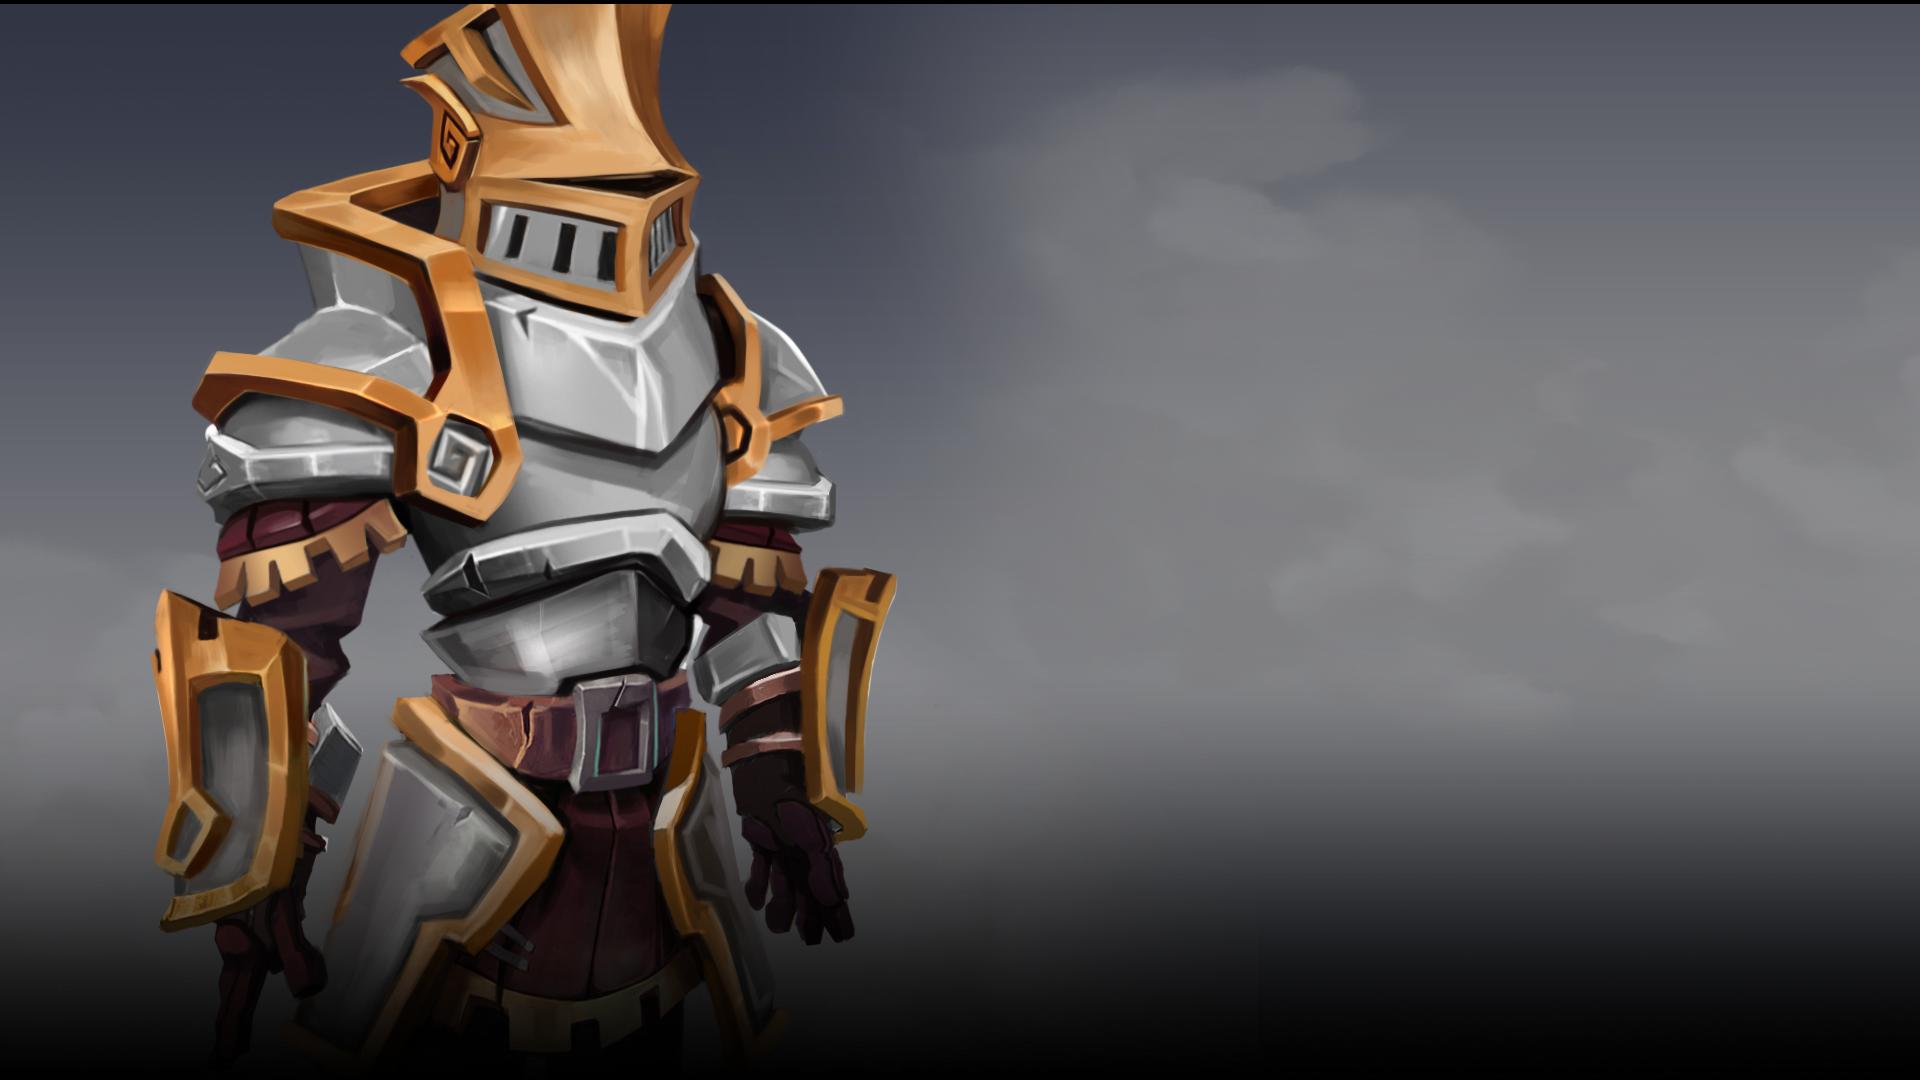 Stalwart Knight